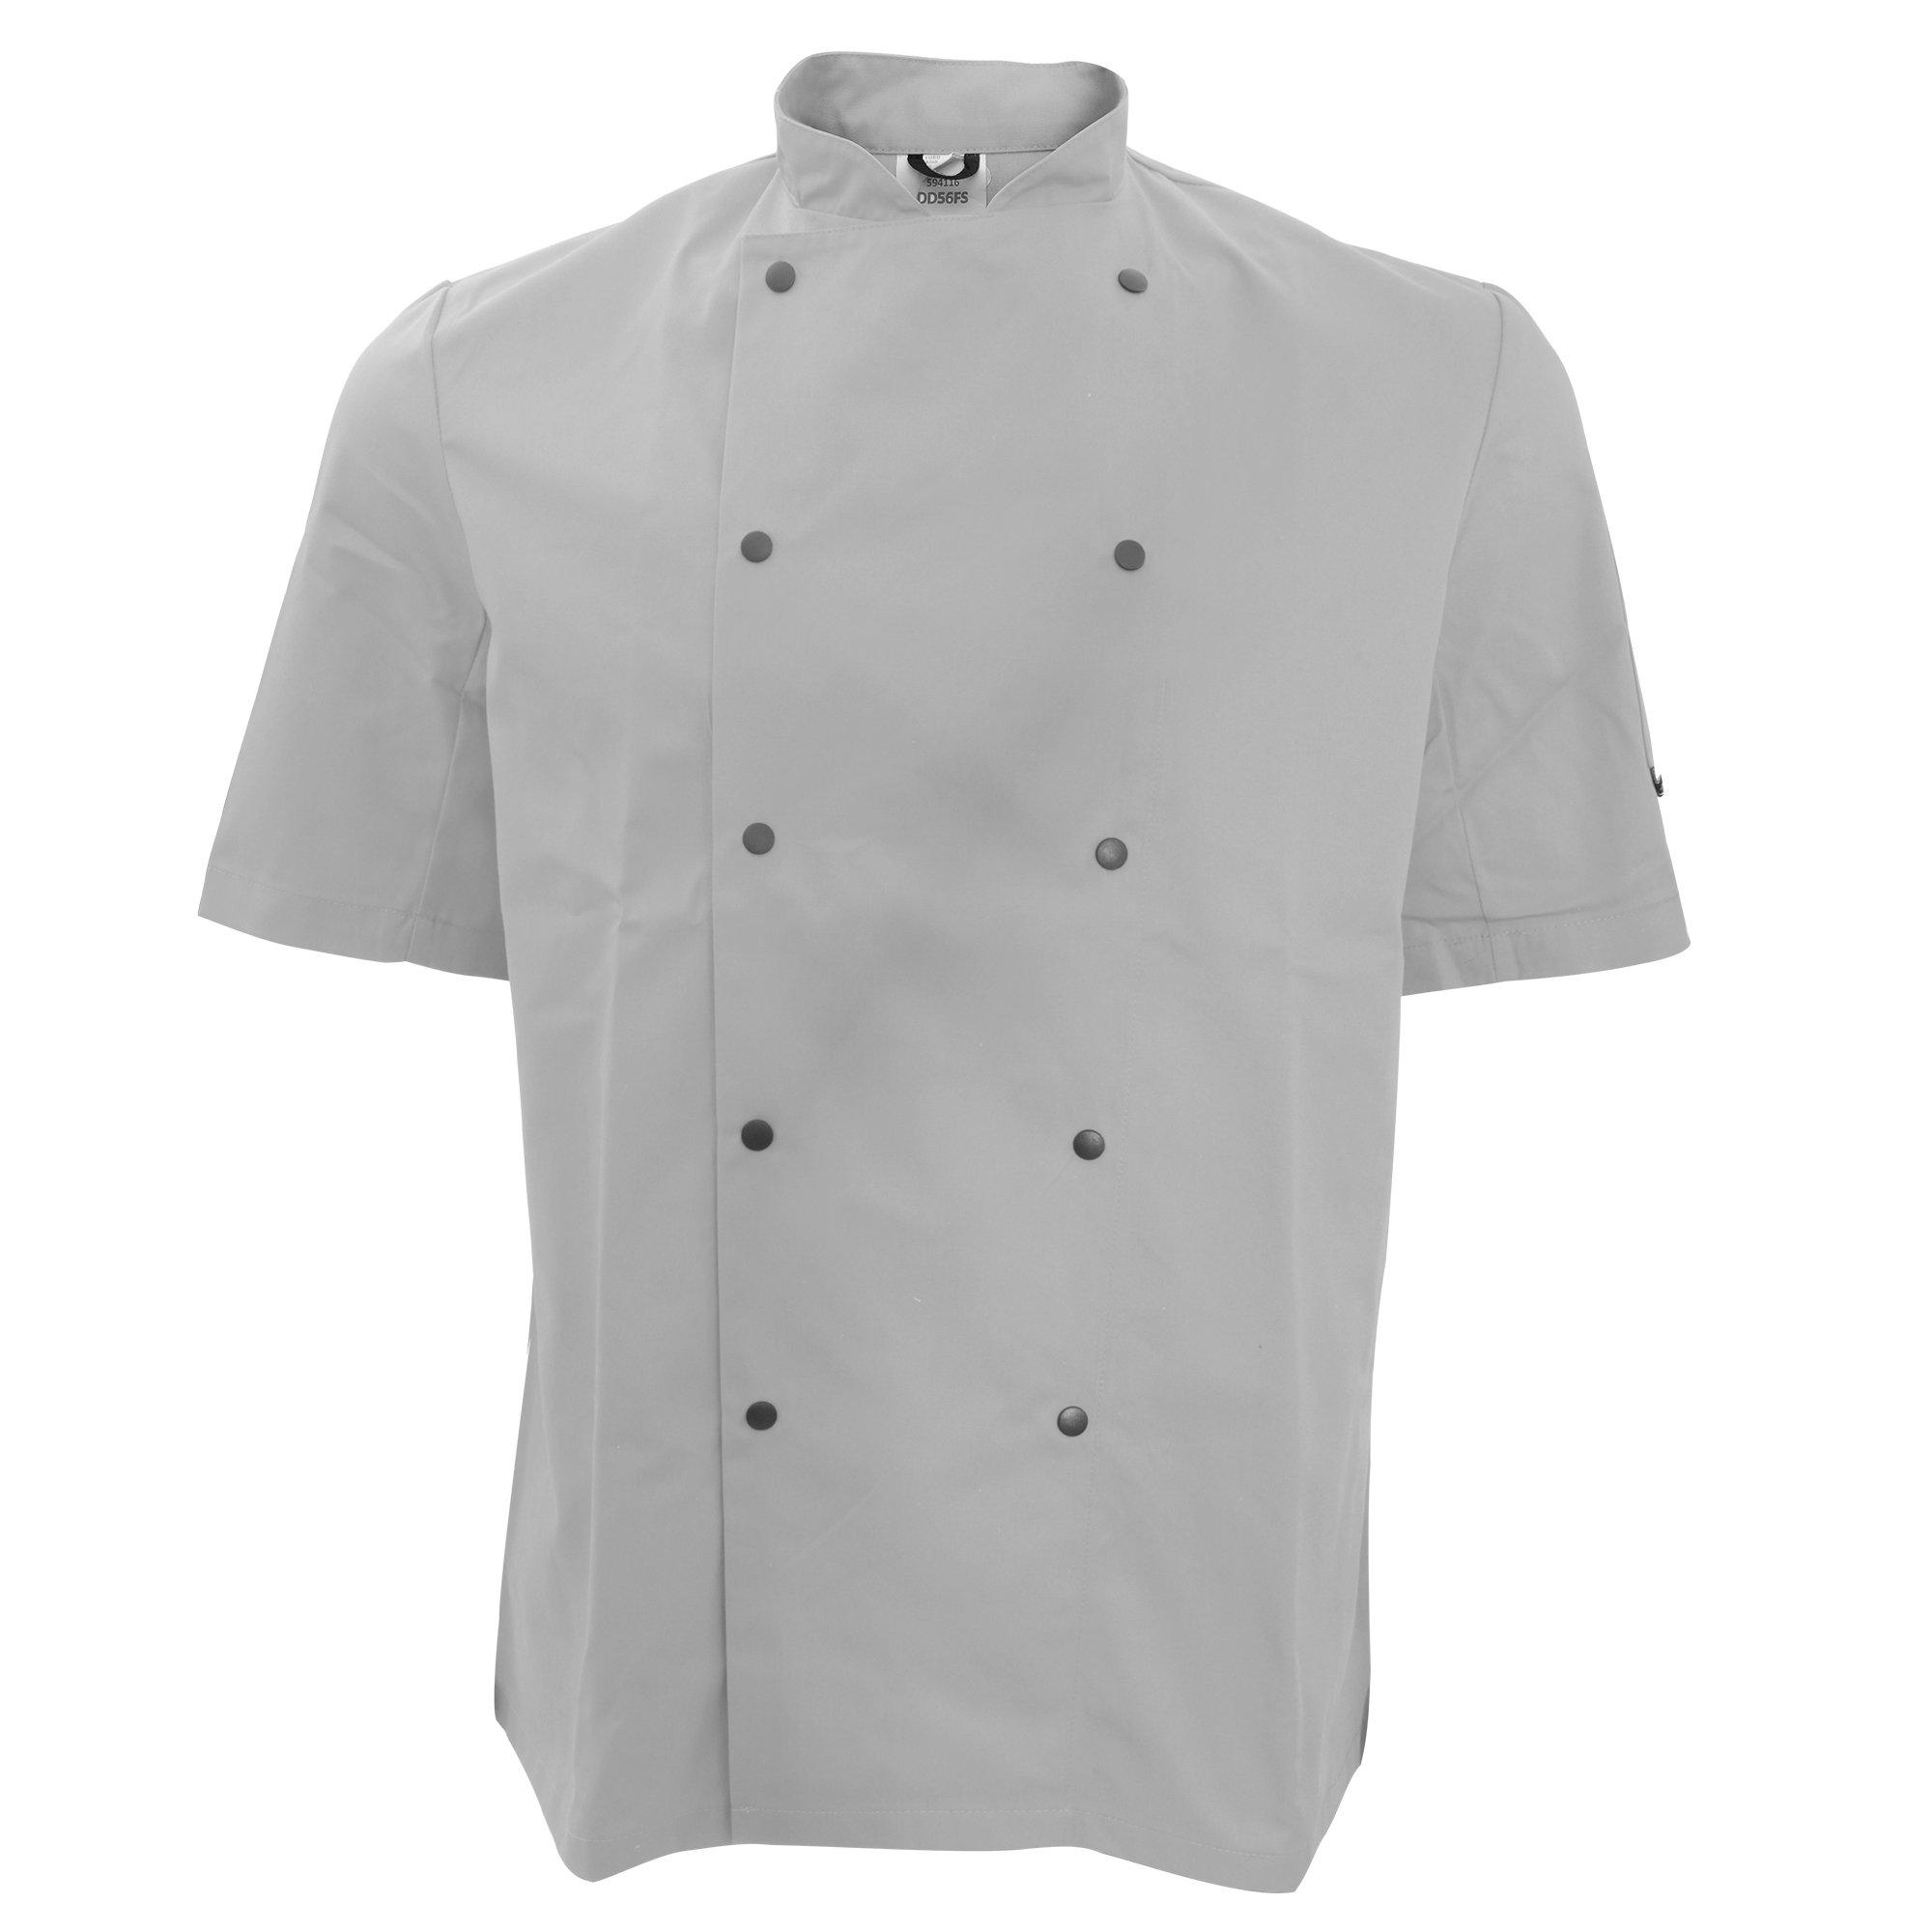 Dennys Unisex Short Sleeve Stud Button Chef Jacket (S) (Light Grey)